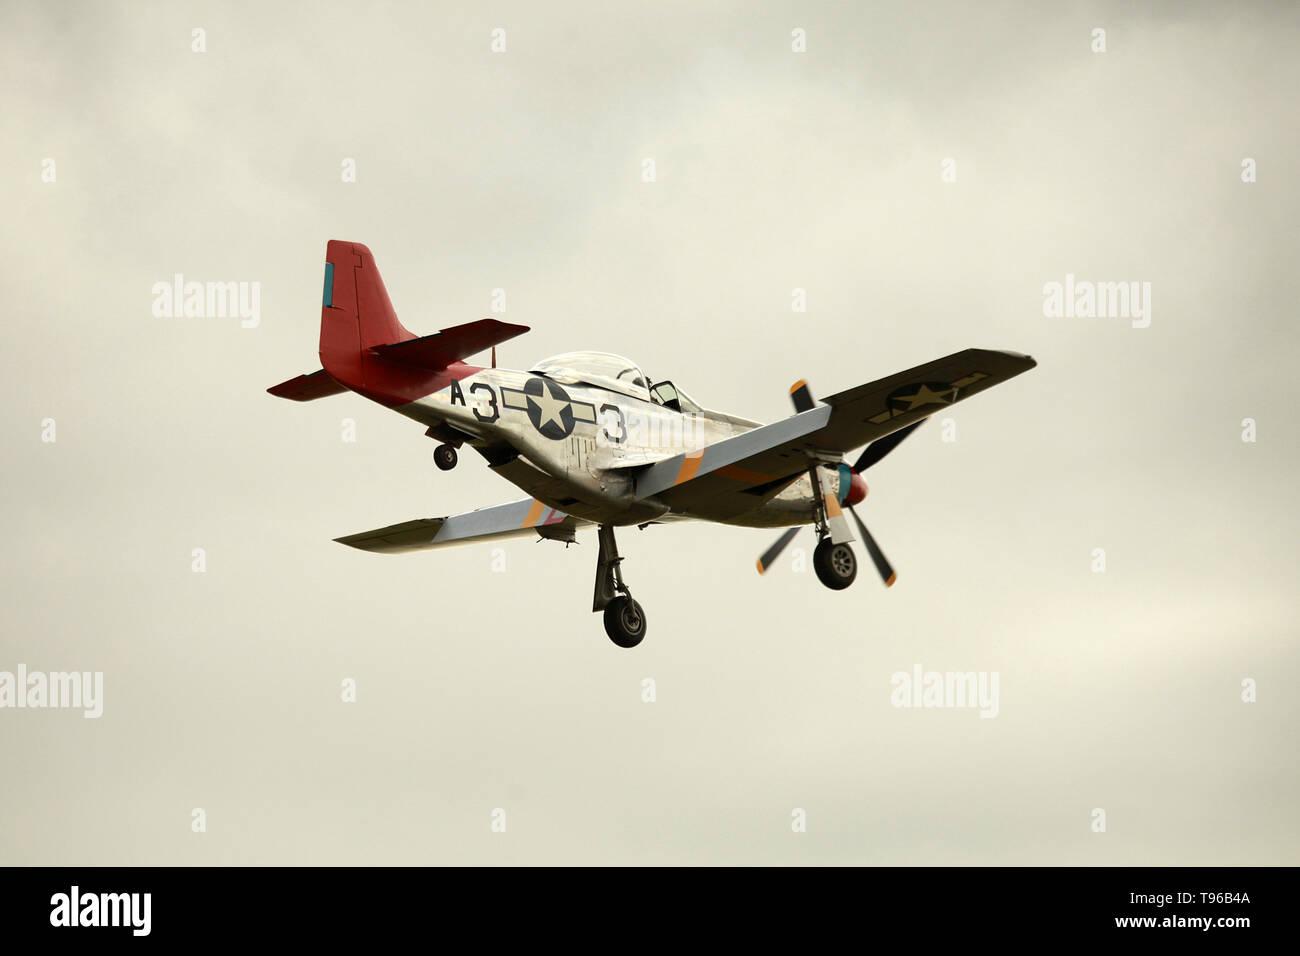 North American P-51 Mustang, Tuskegee Airmen, - Stock Image